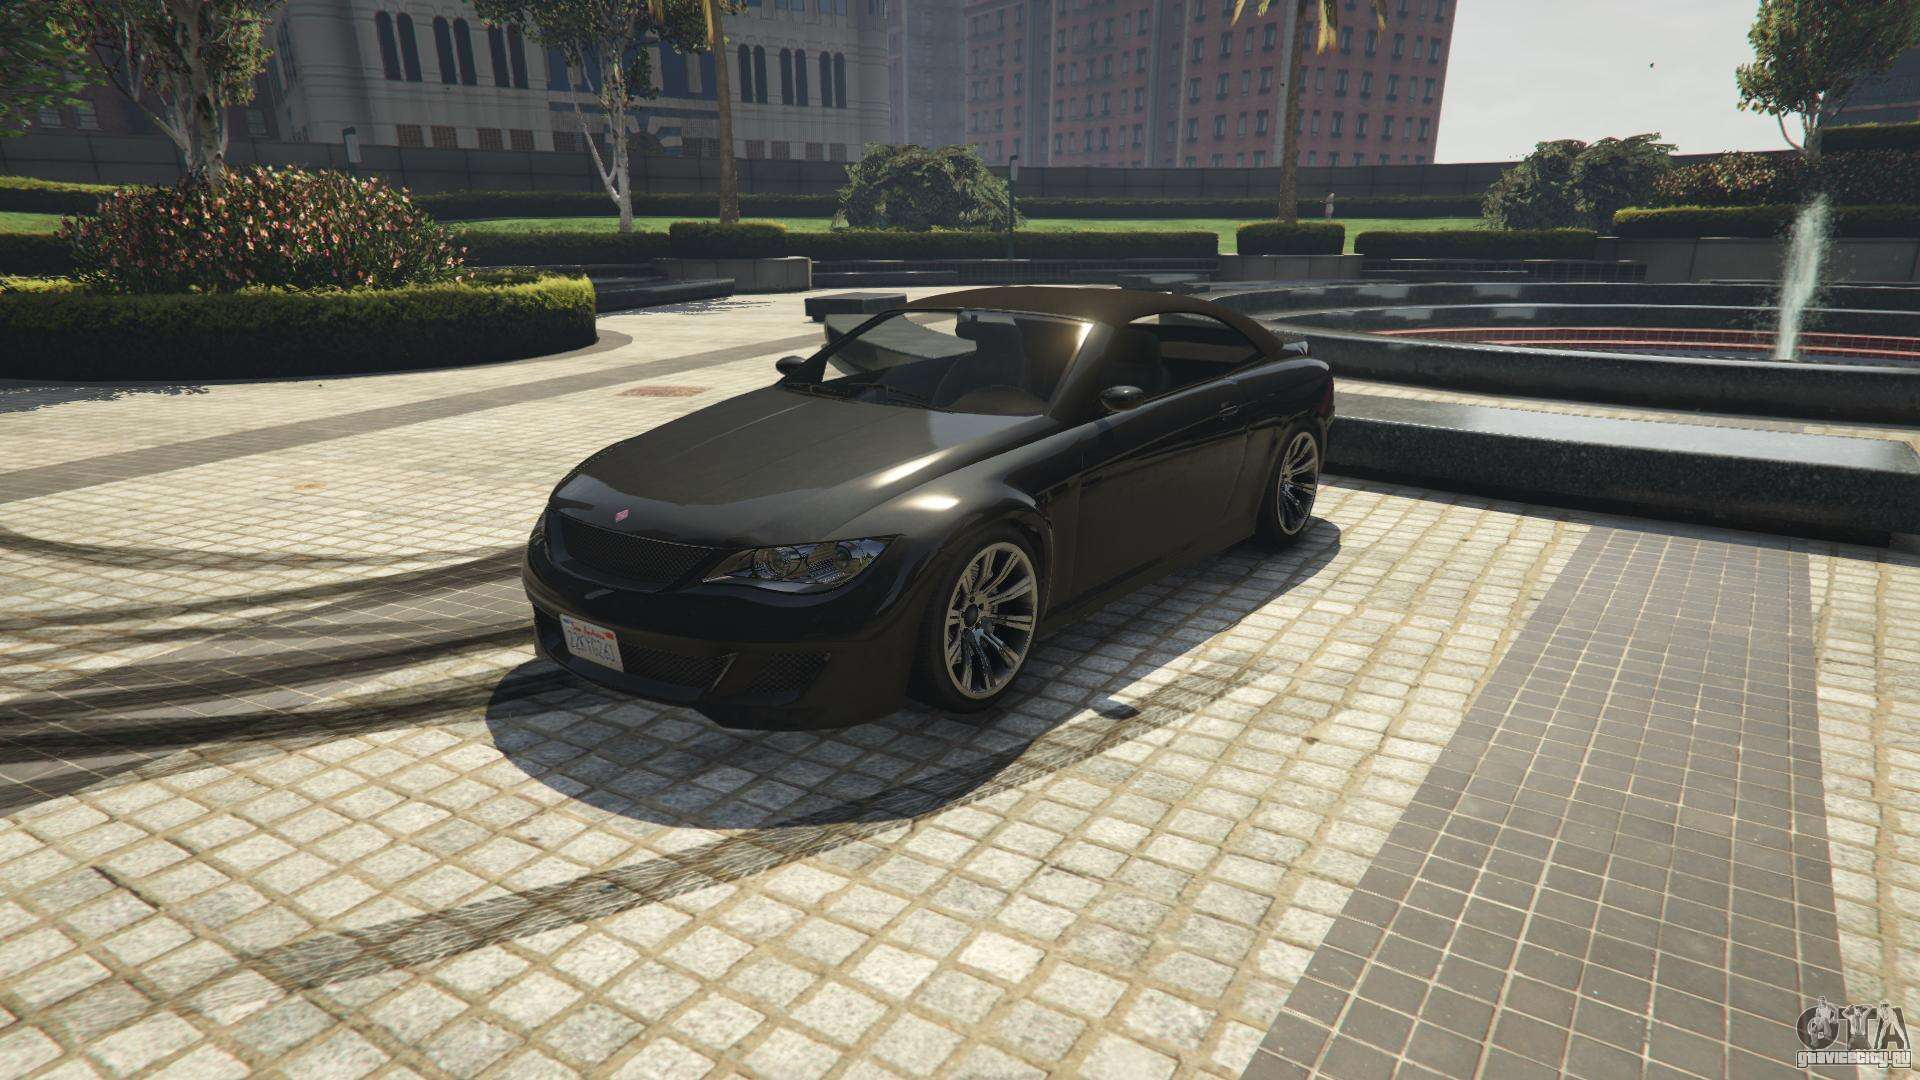 Ubermacht Zion Cabrio из GTA 5 - вид спереди